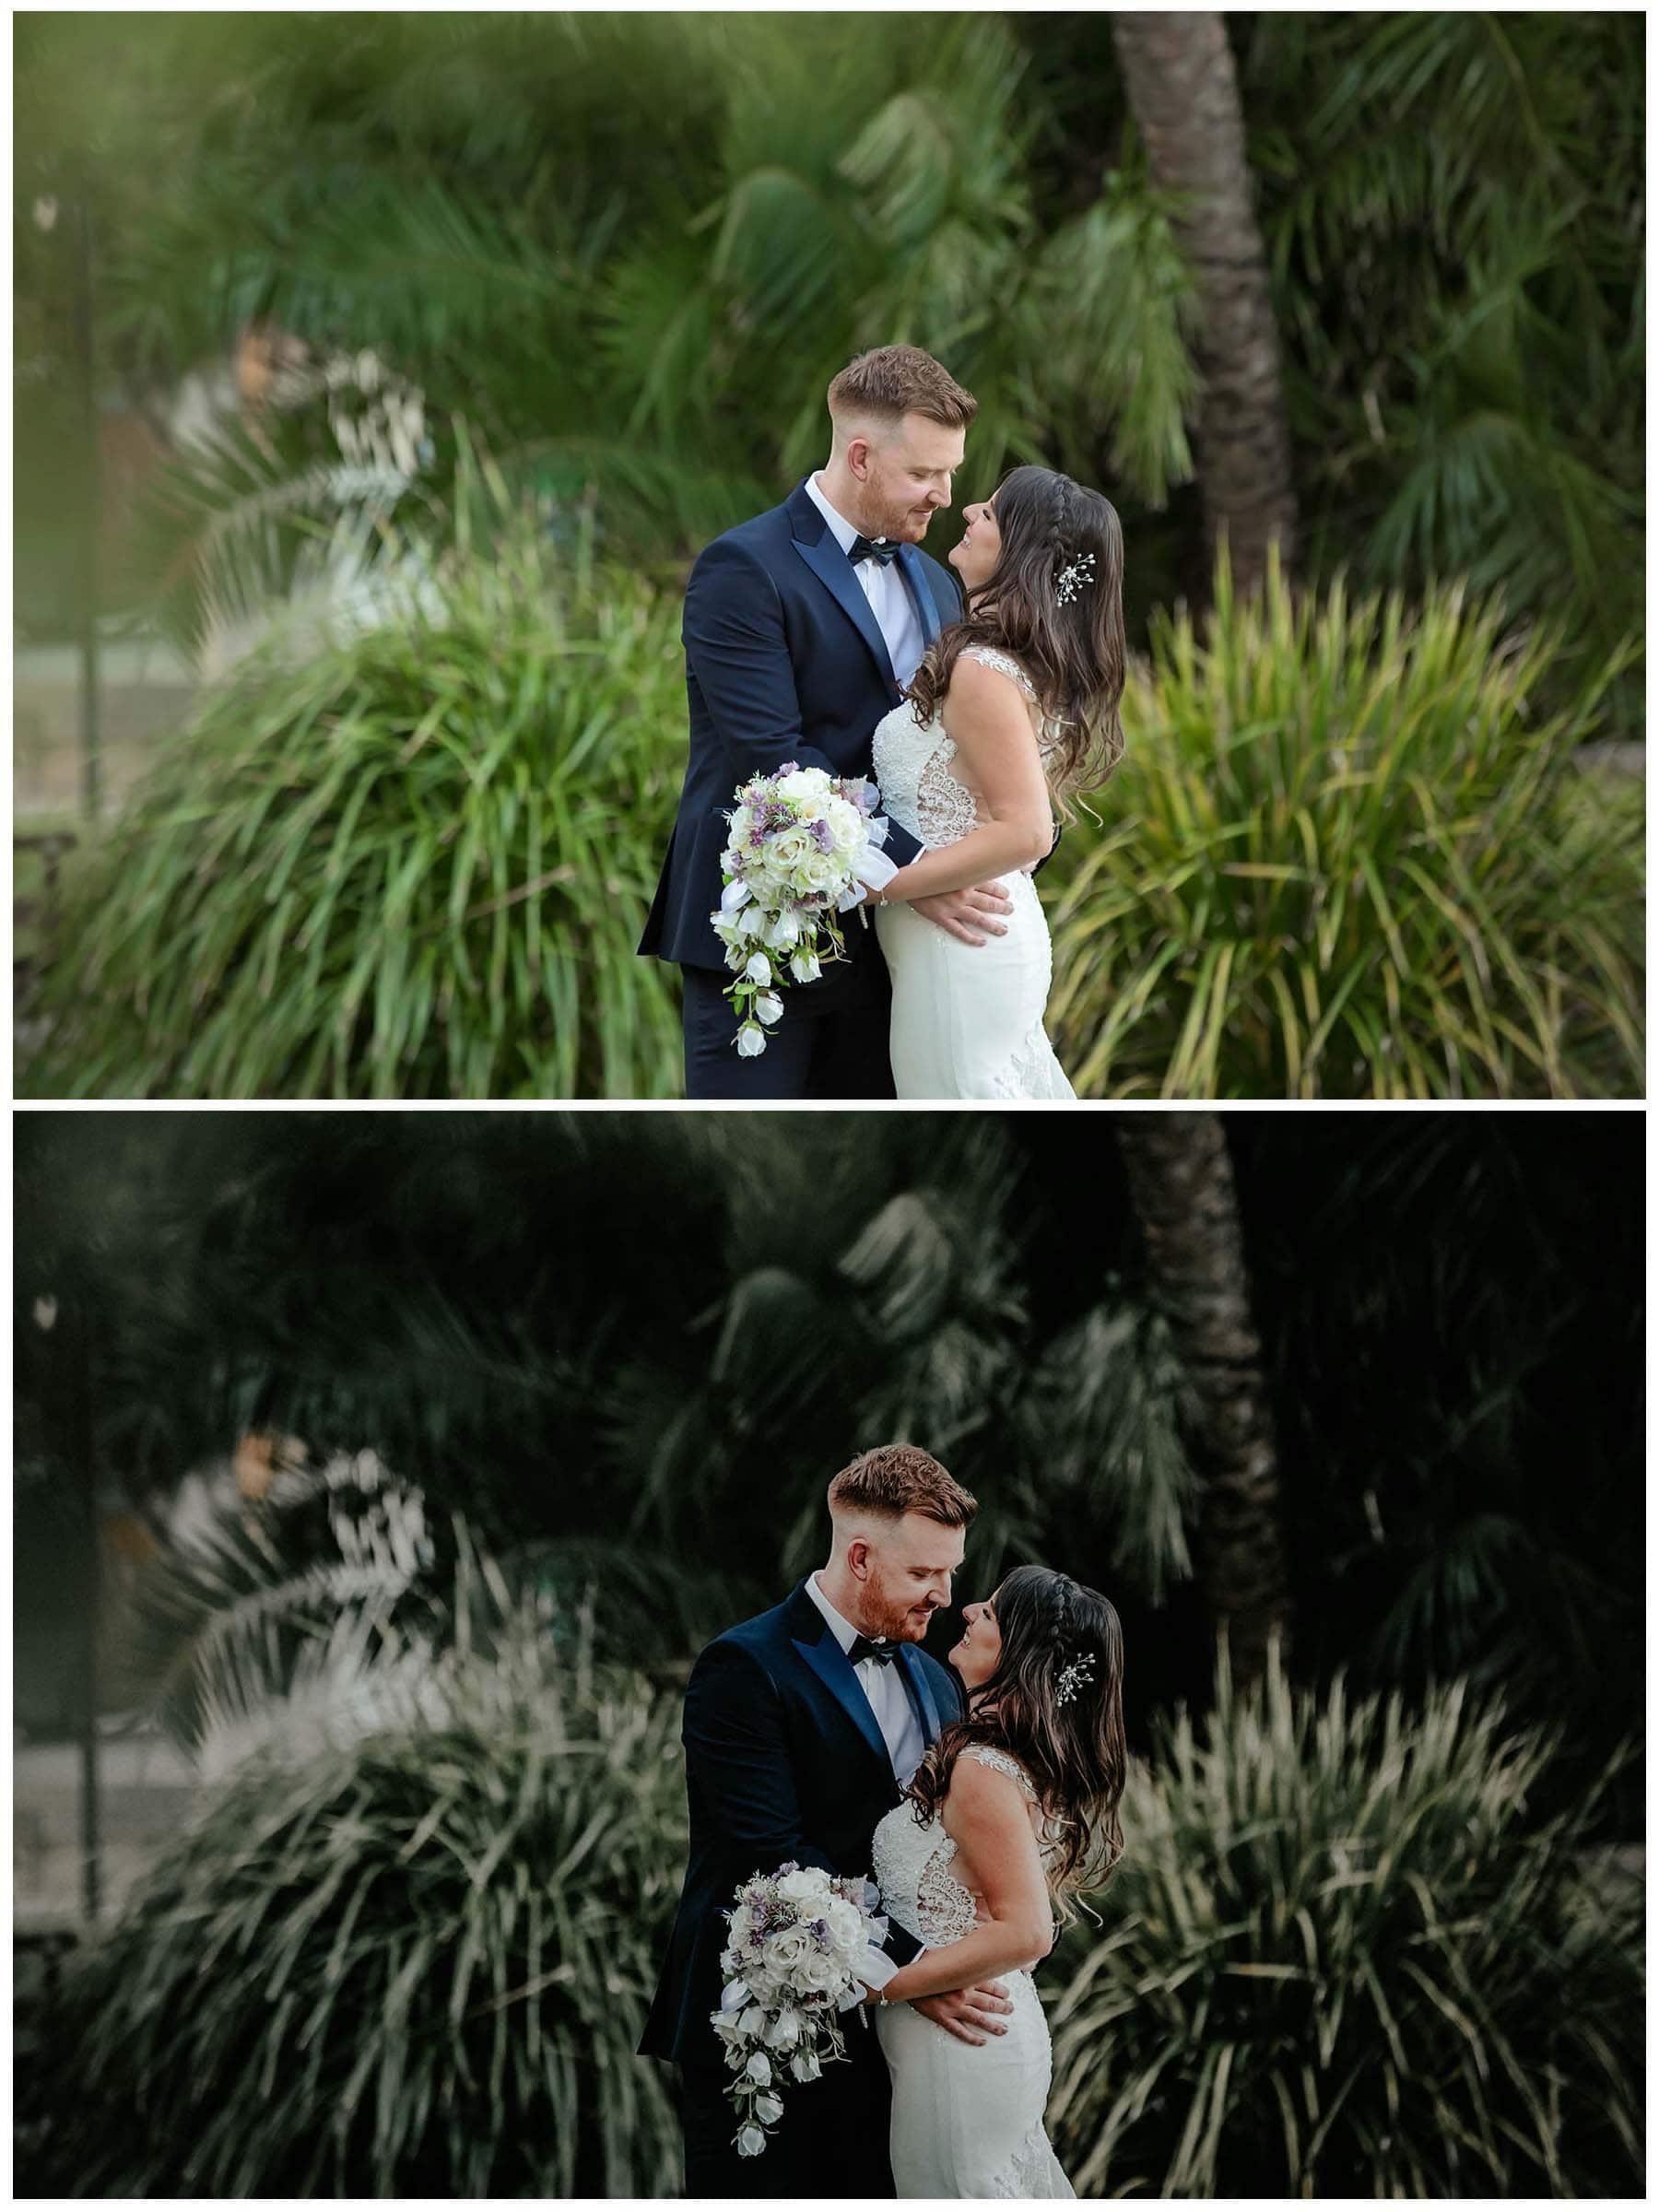 filterless, Filterless Wedding Photography